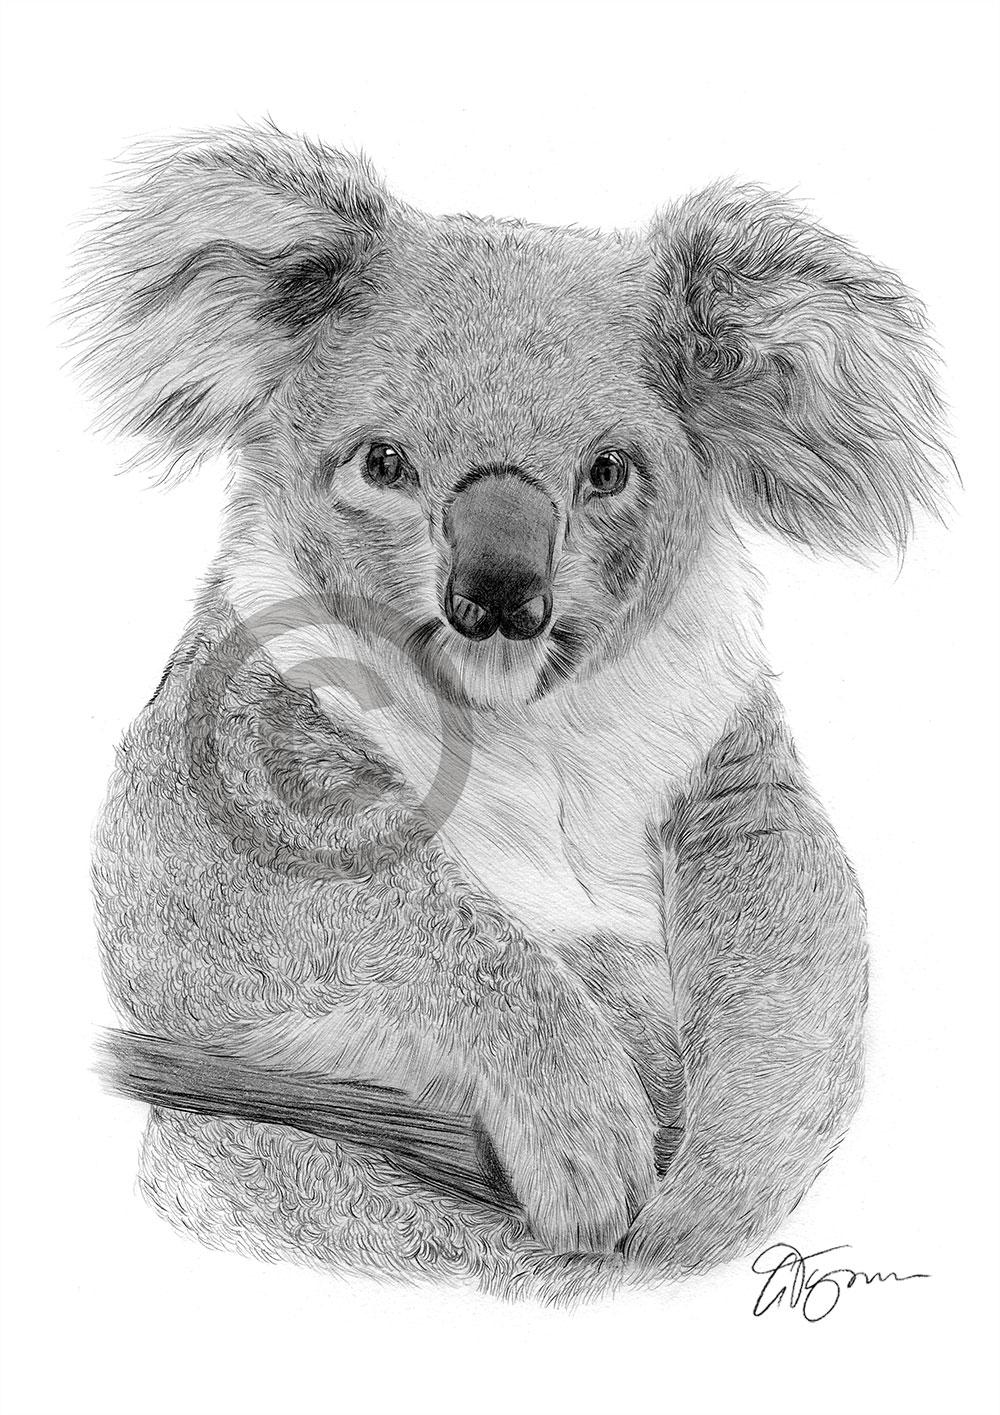 Pencil Drawing Of A Koala By Artist Gary Tymon